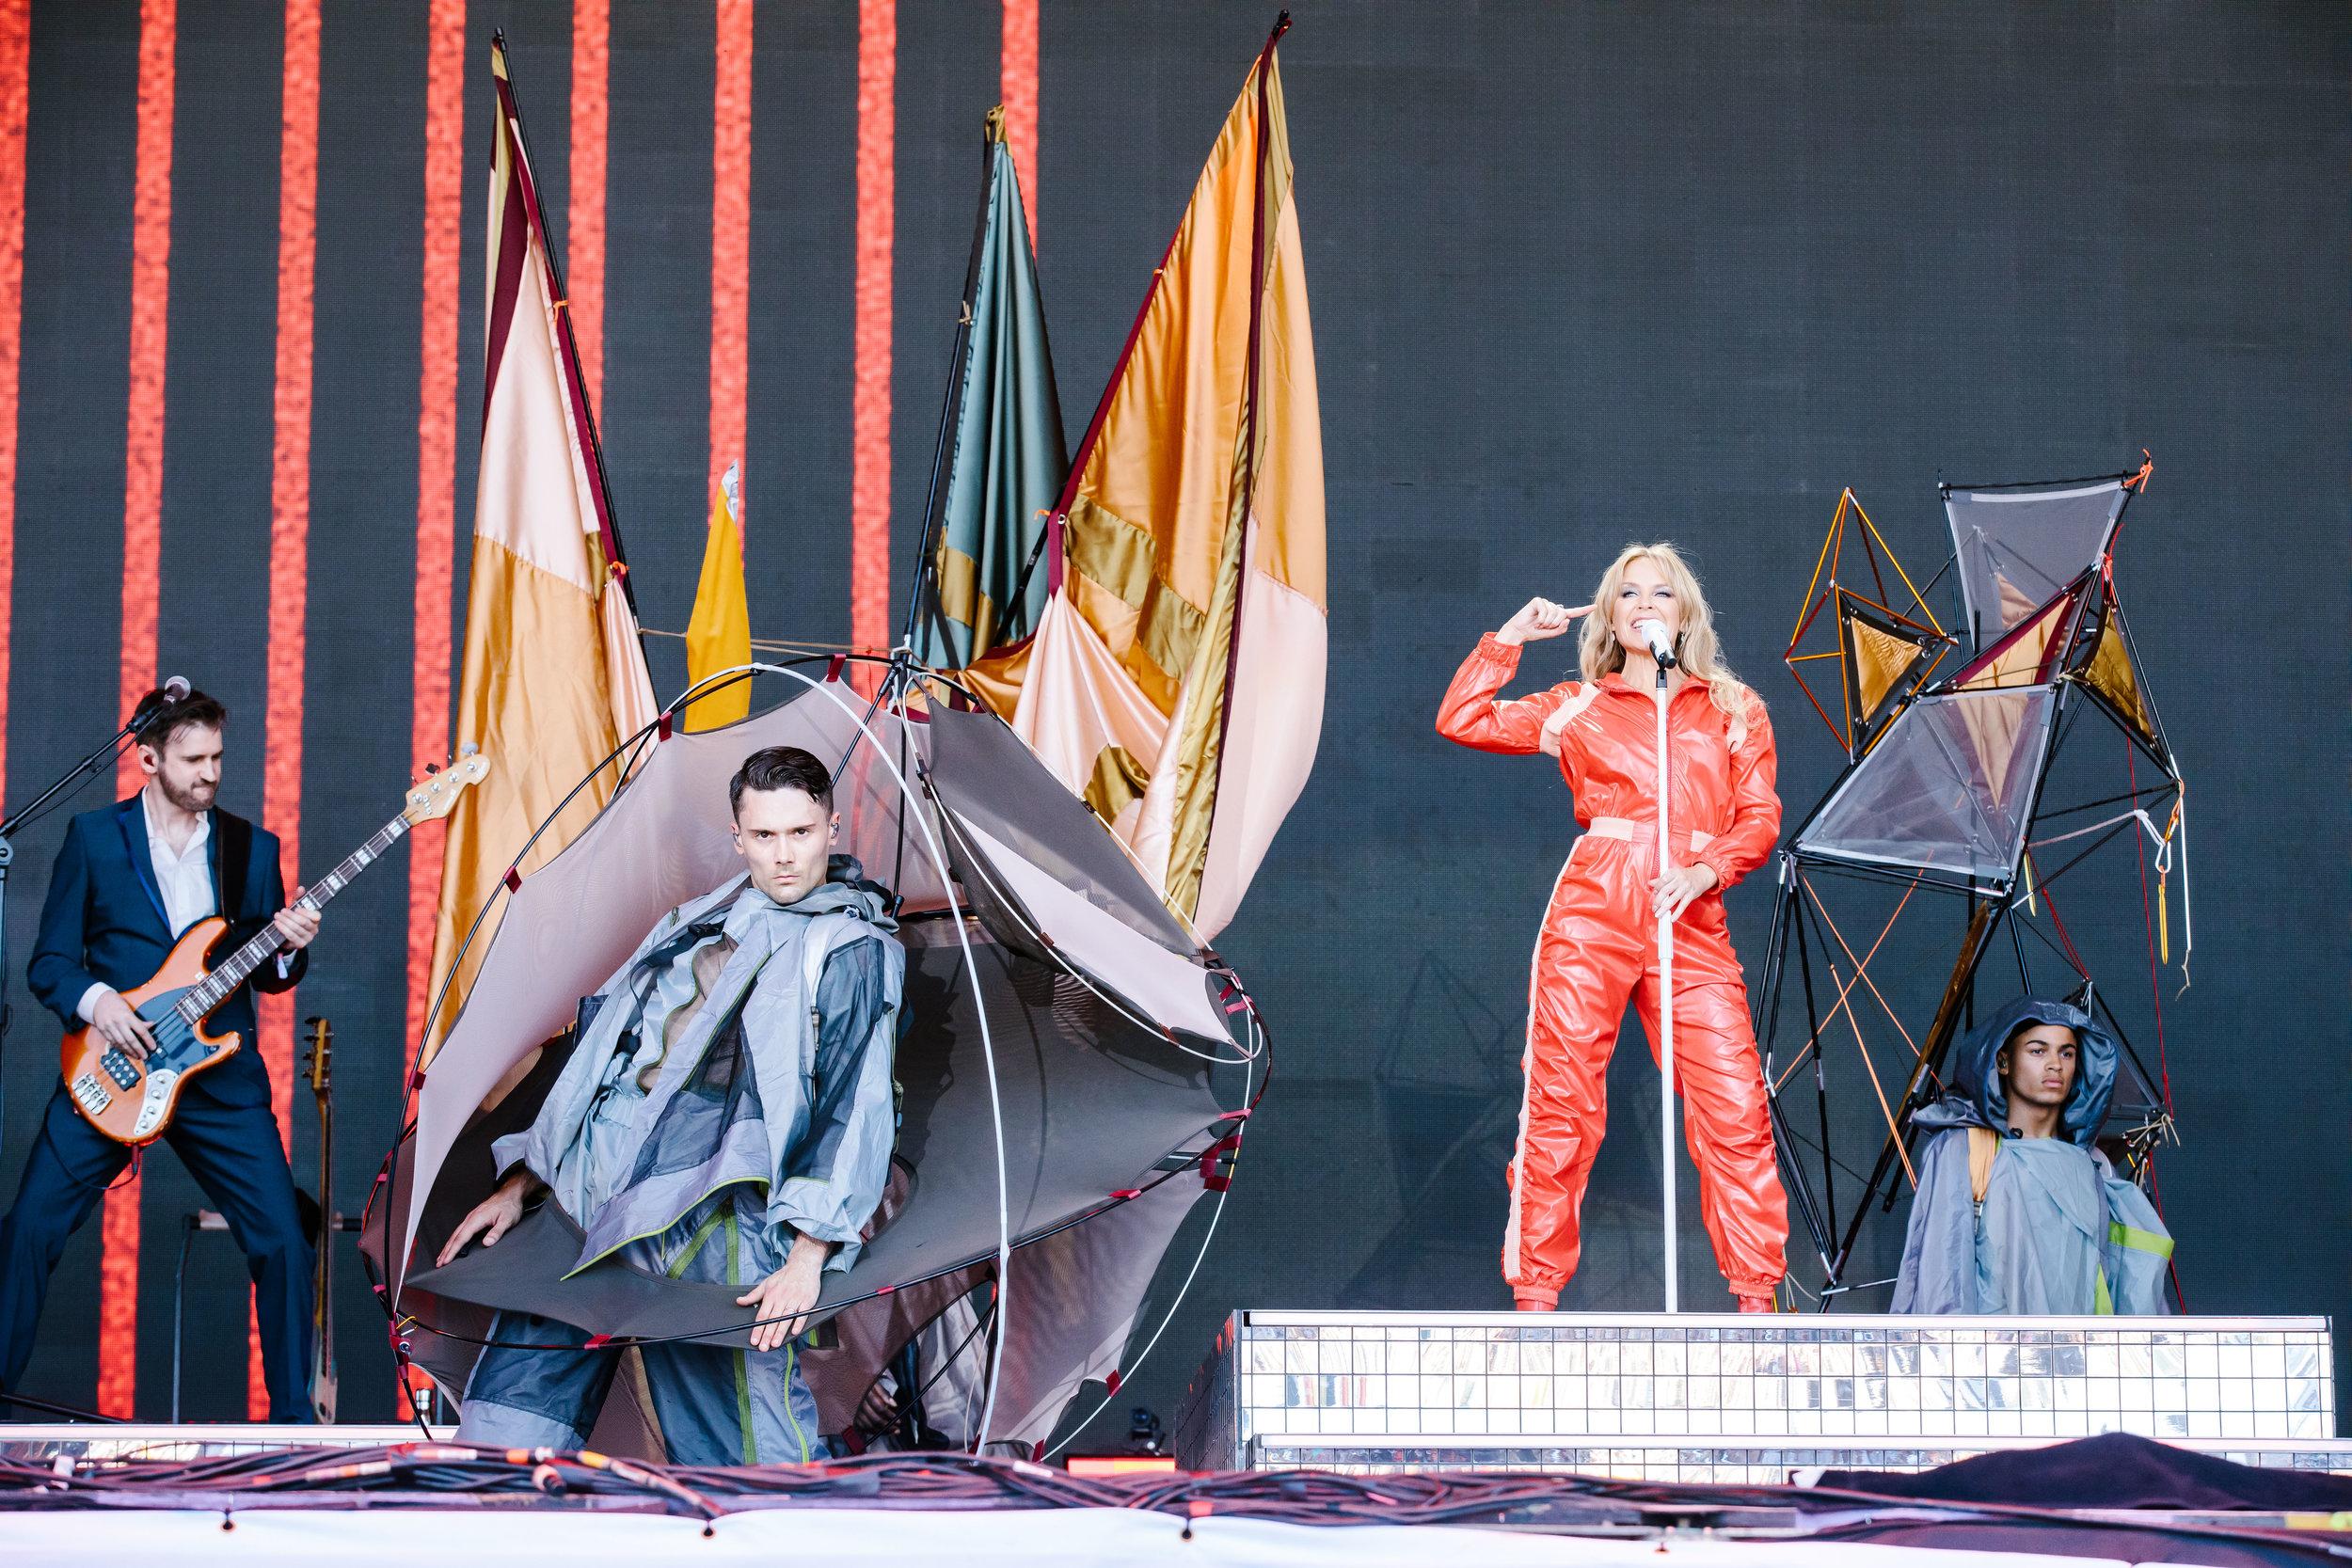 Kylie Minogue, Glastonbury, 2019